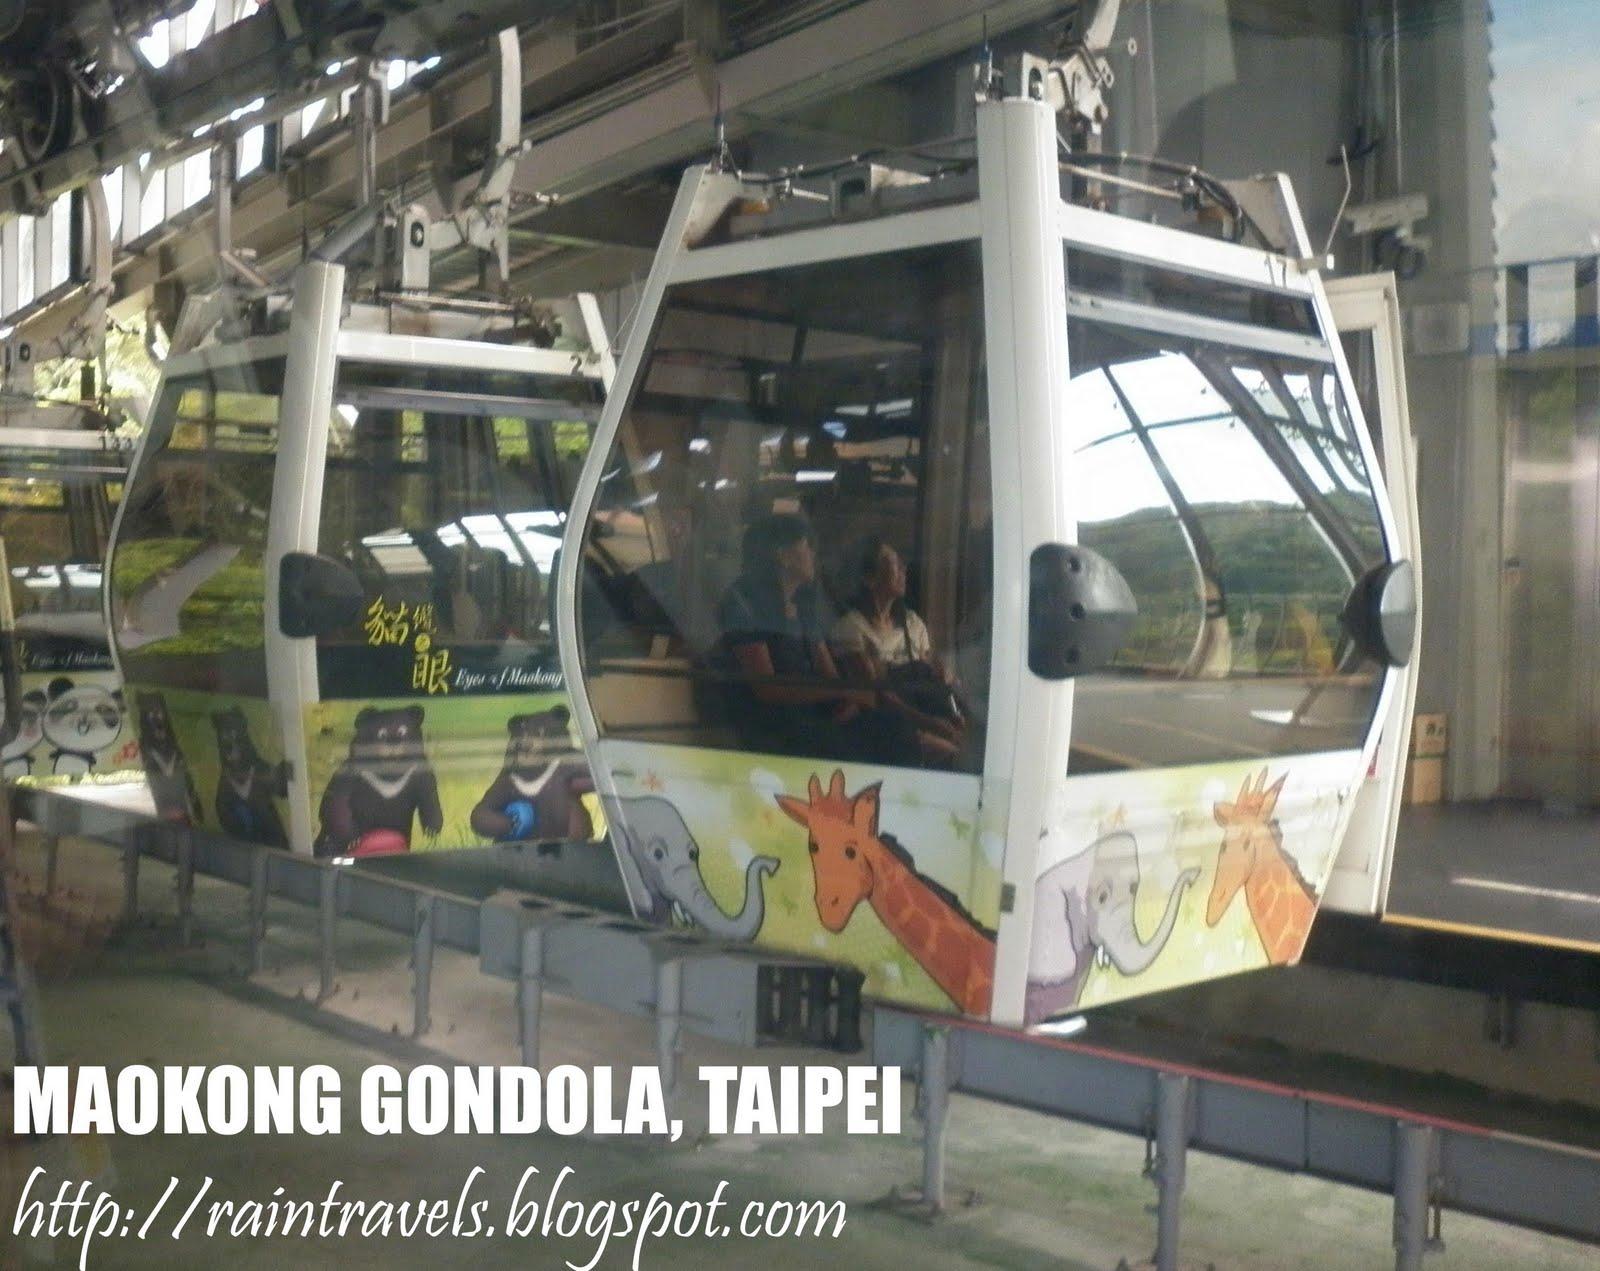 The Maokong Gondola Ticket {Forum Aden}